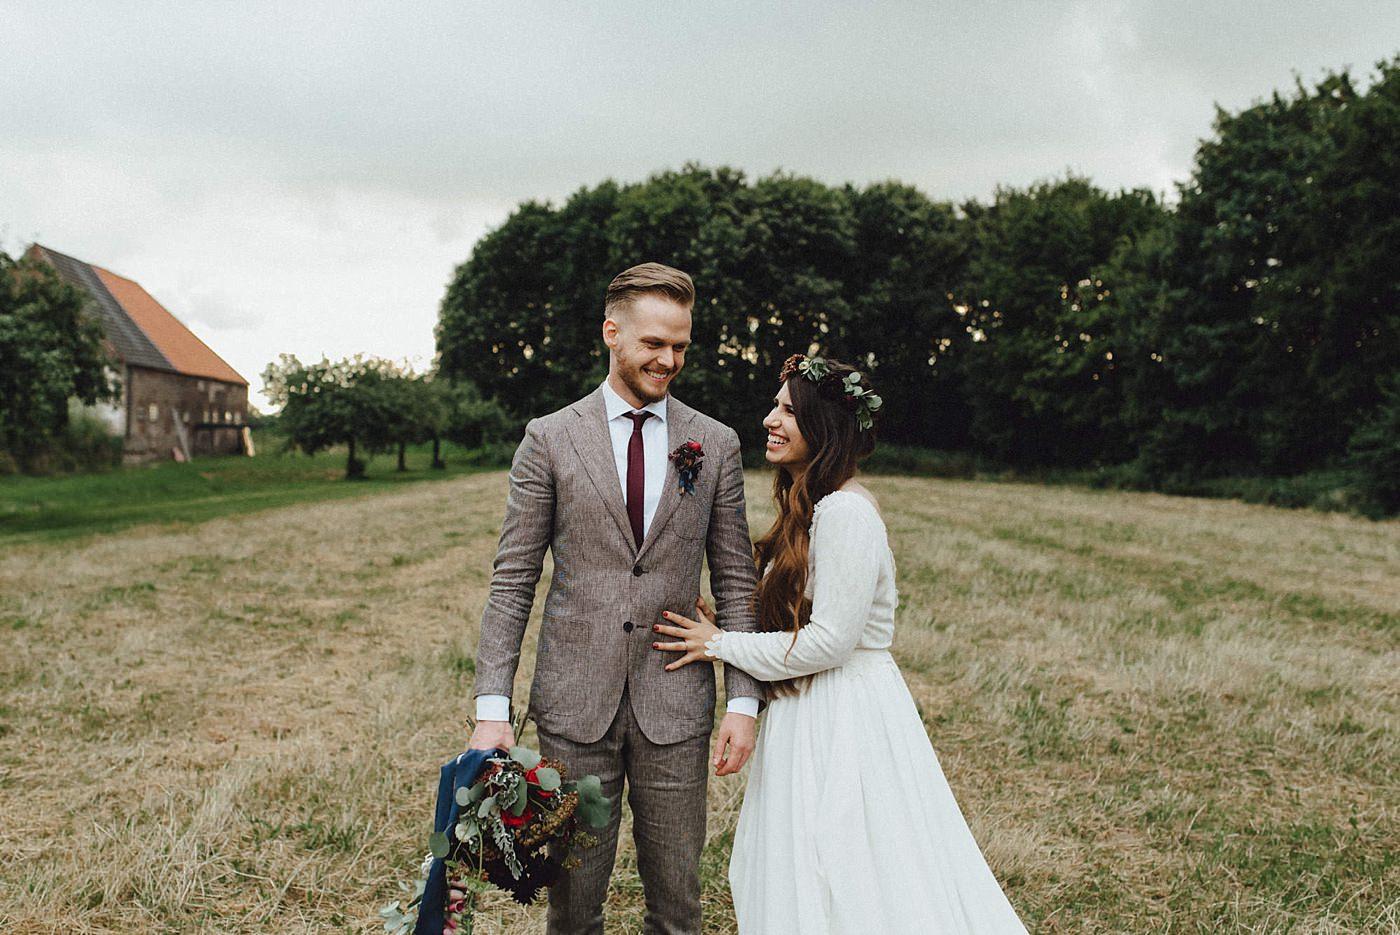 urban-elopement-wedding-226